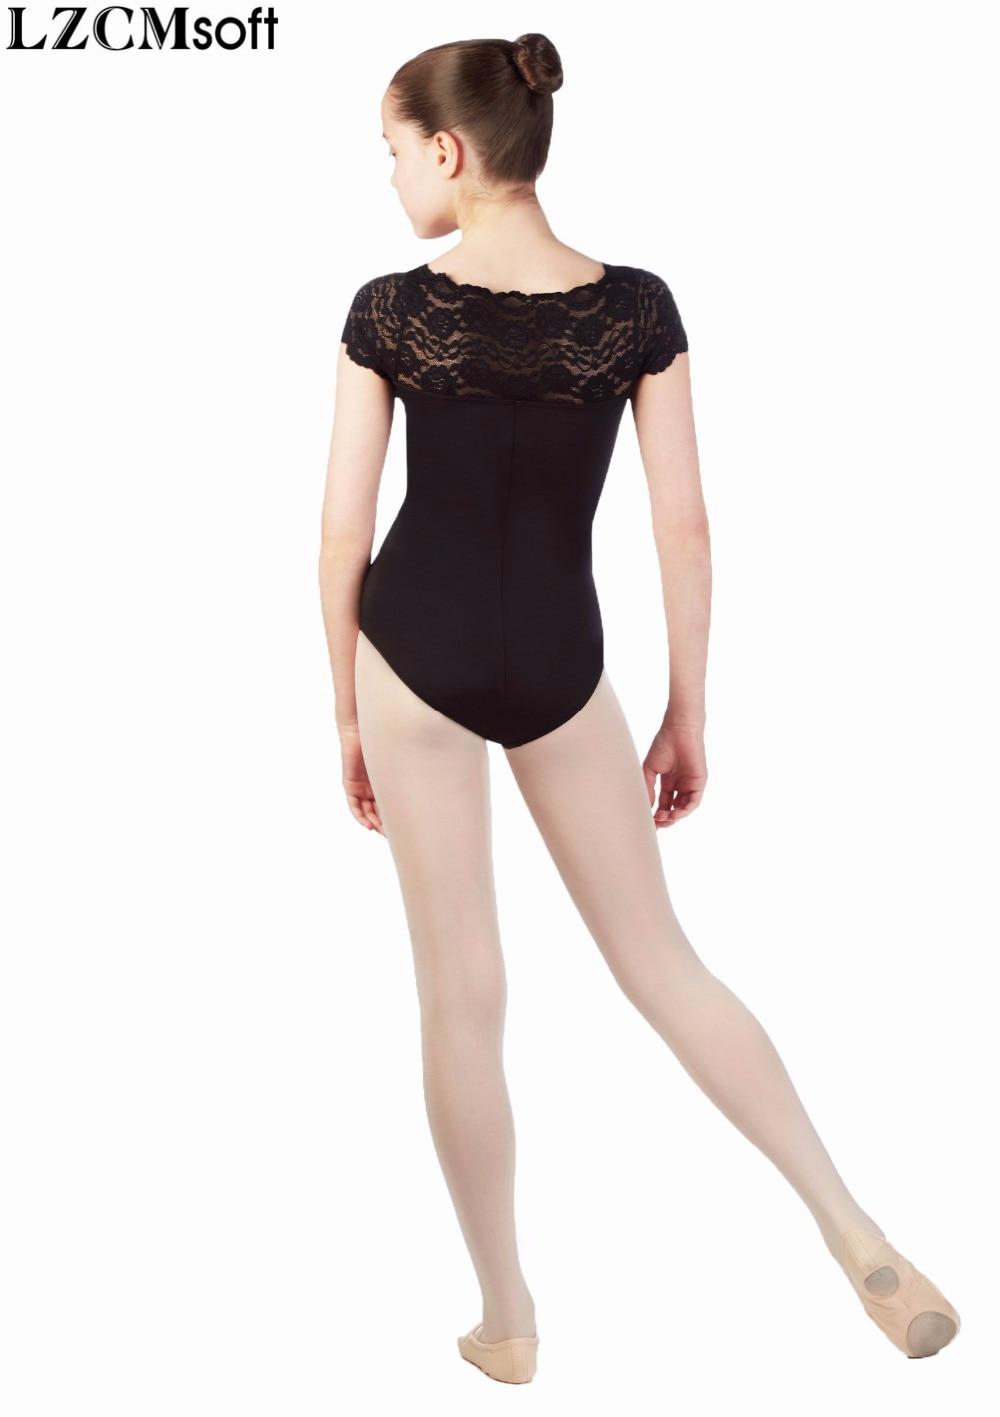 LZCMsoft Girls Lace Black Leotard For Gymnastics Child Spandex Lycra Short Sleeves Ballet Leotards Dancewear Team Performance